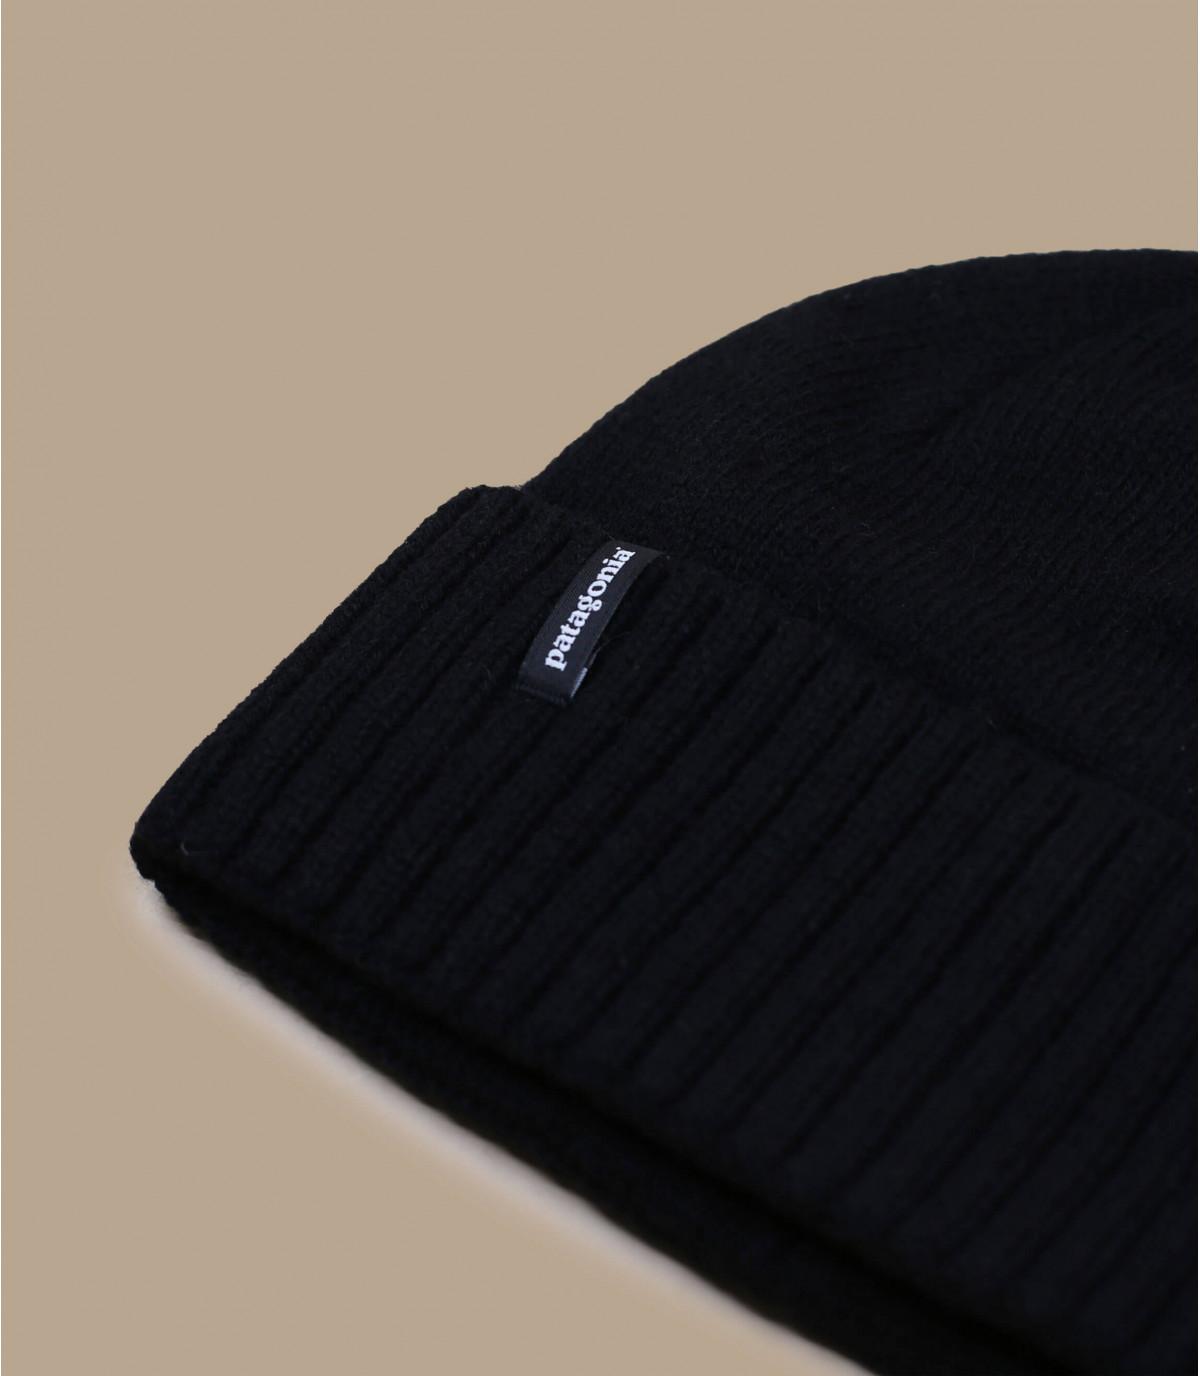 Dettagli Brodeo beanie black - image 3